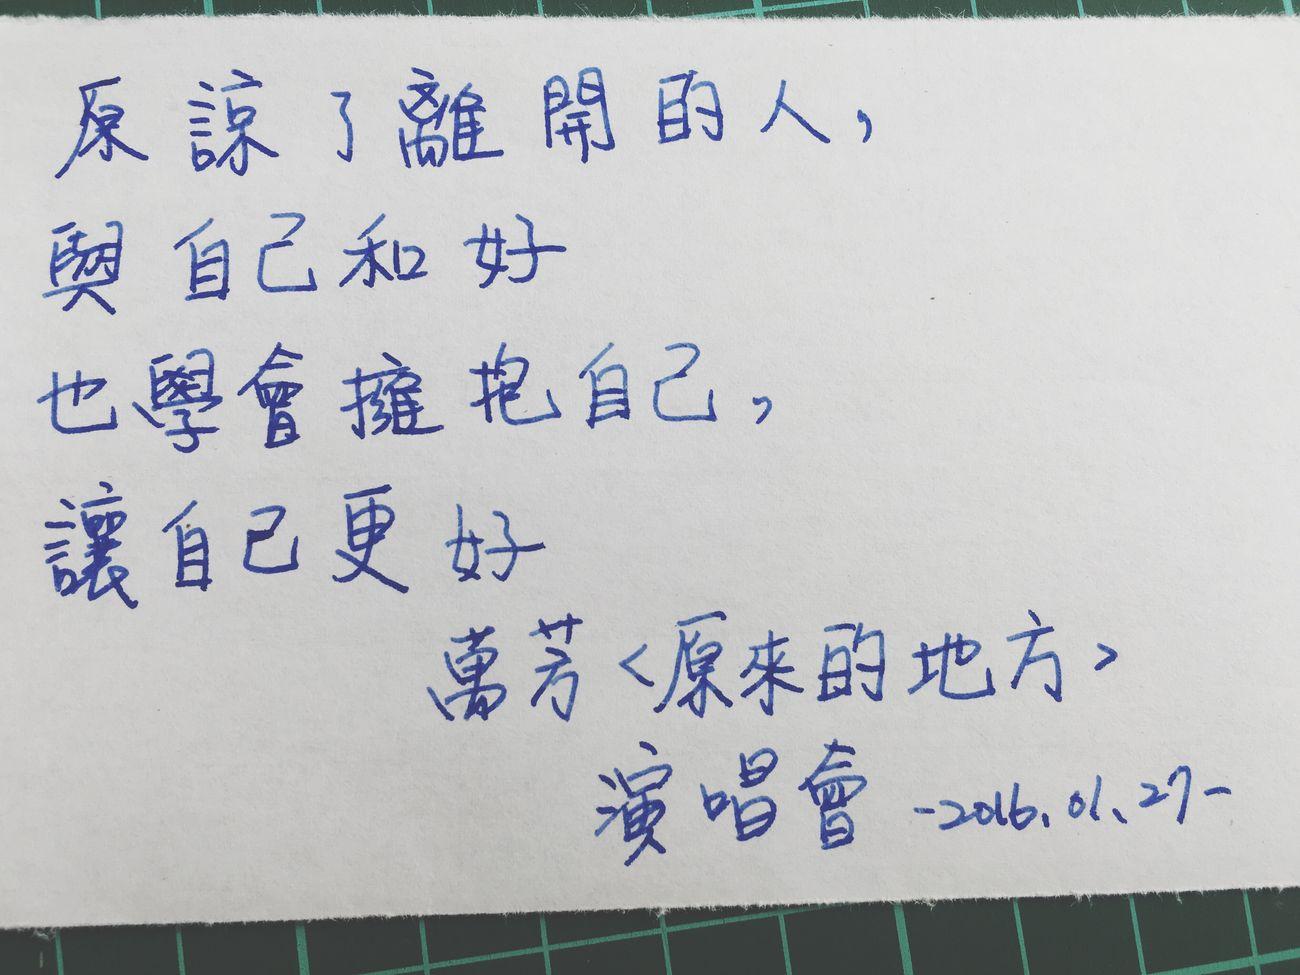 Lamy 前鎮區 January 墨水 文具 一月 中文 臺灣 Taiwan 鋼筆 高雄 Kaohsiung Taiwanese